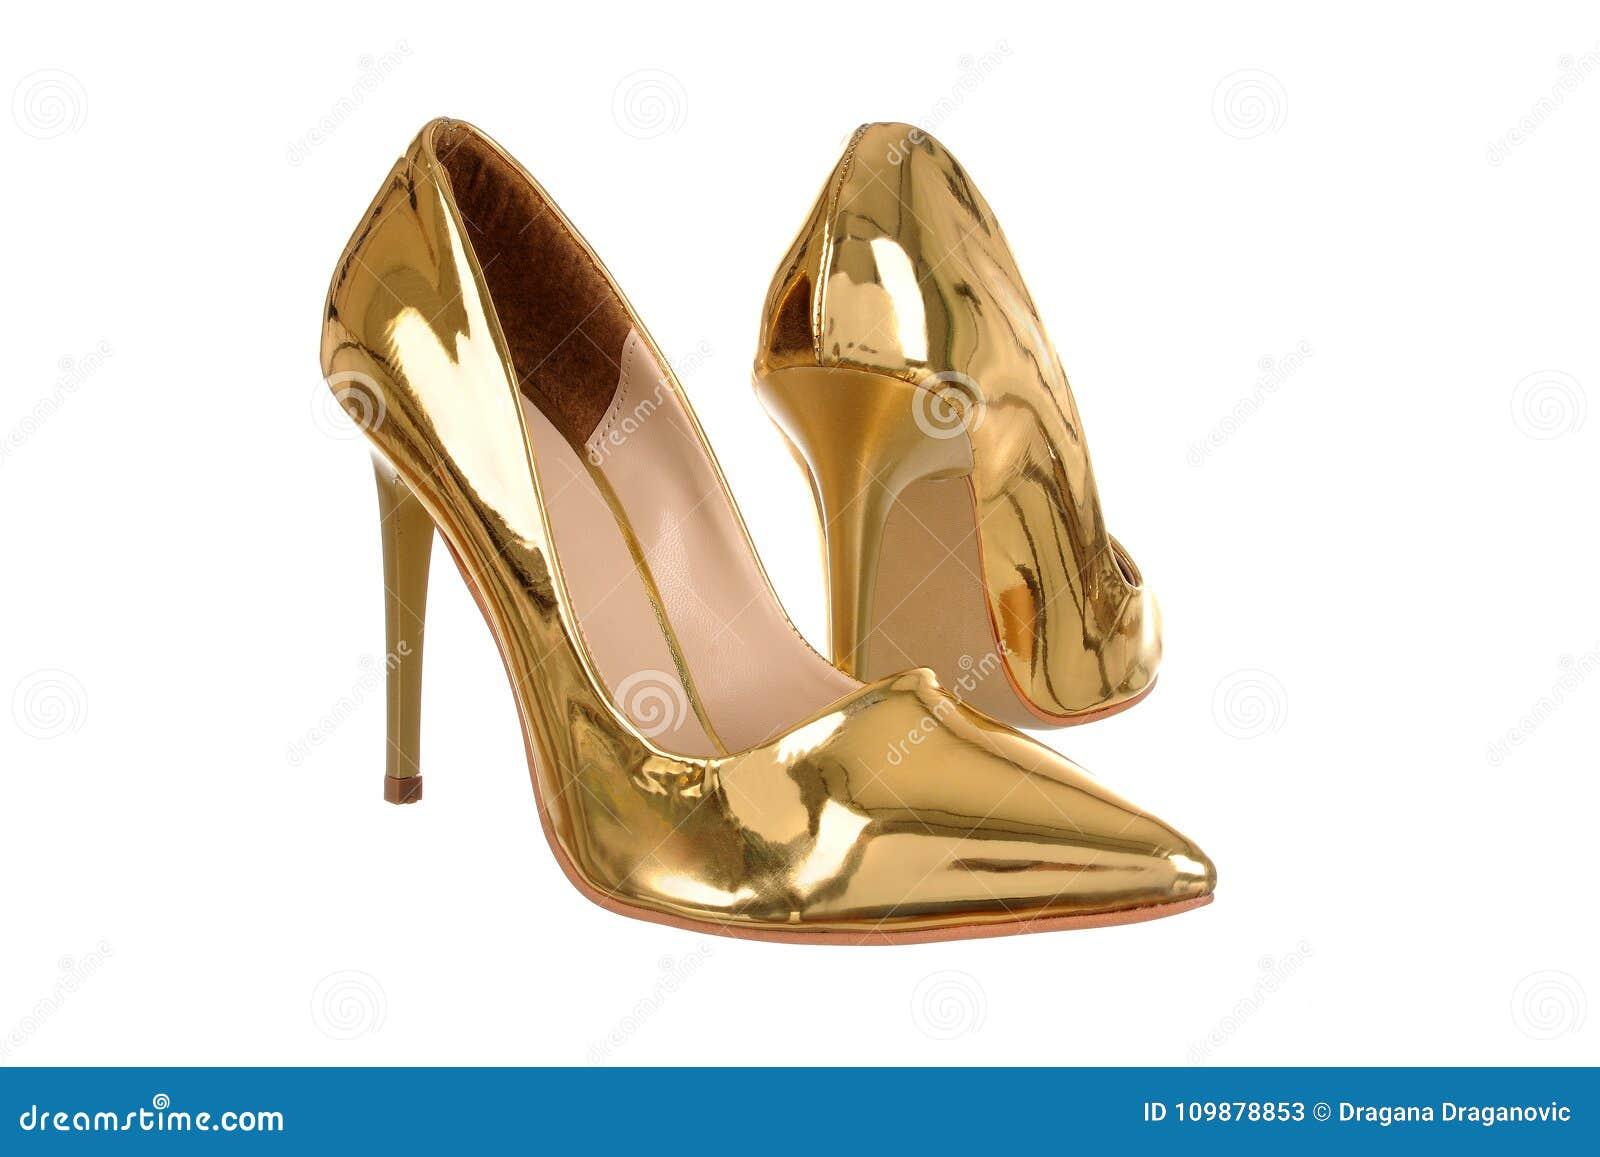 0be6c5b60a9 Χρυσά υψηλά παπούτσια γυναικών τακουνιών Στοκ Εικόνα - εικόνα από ...